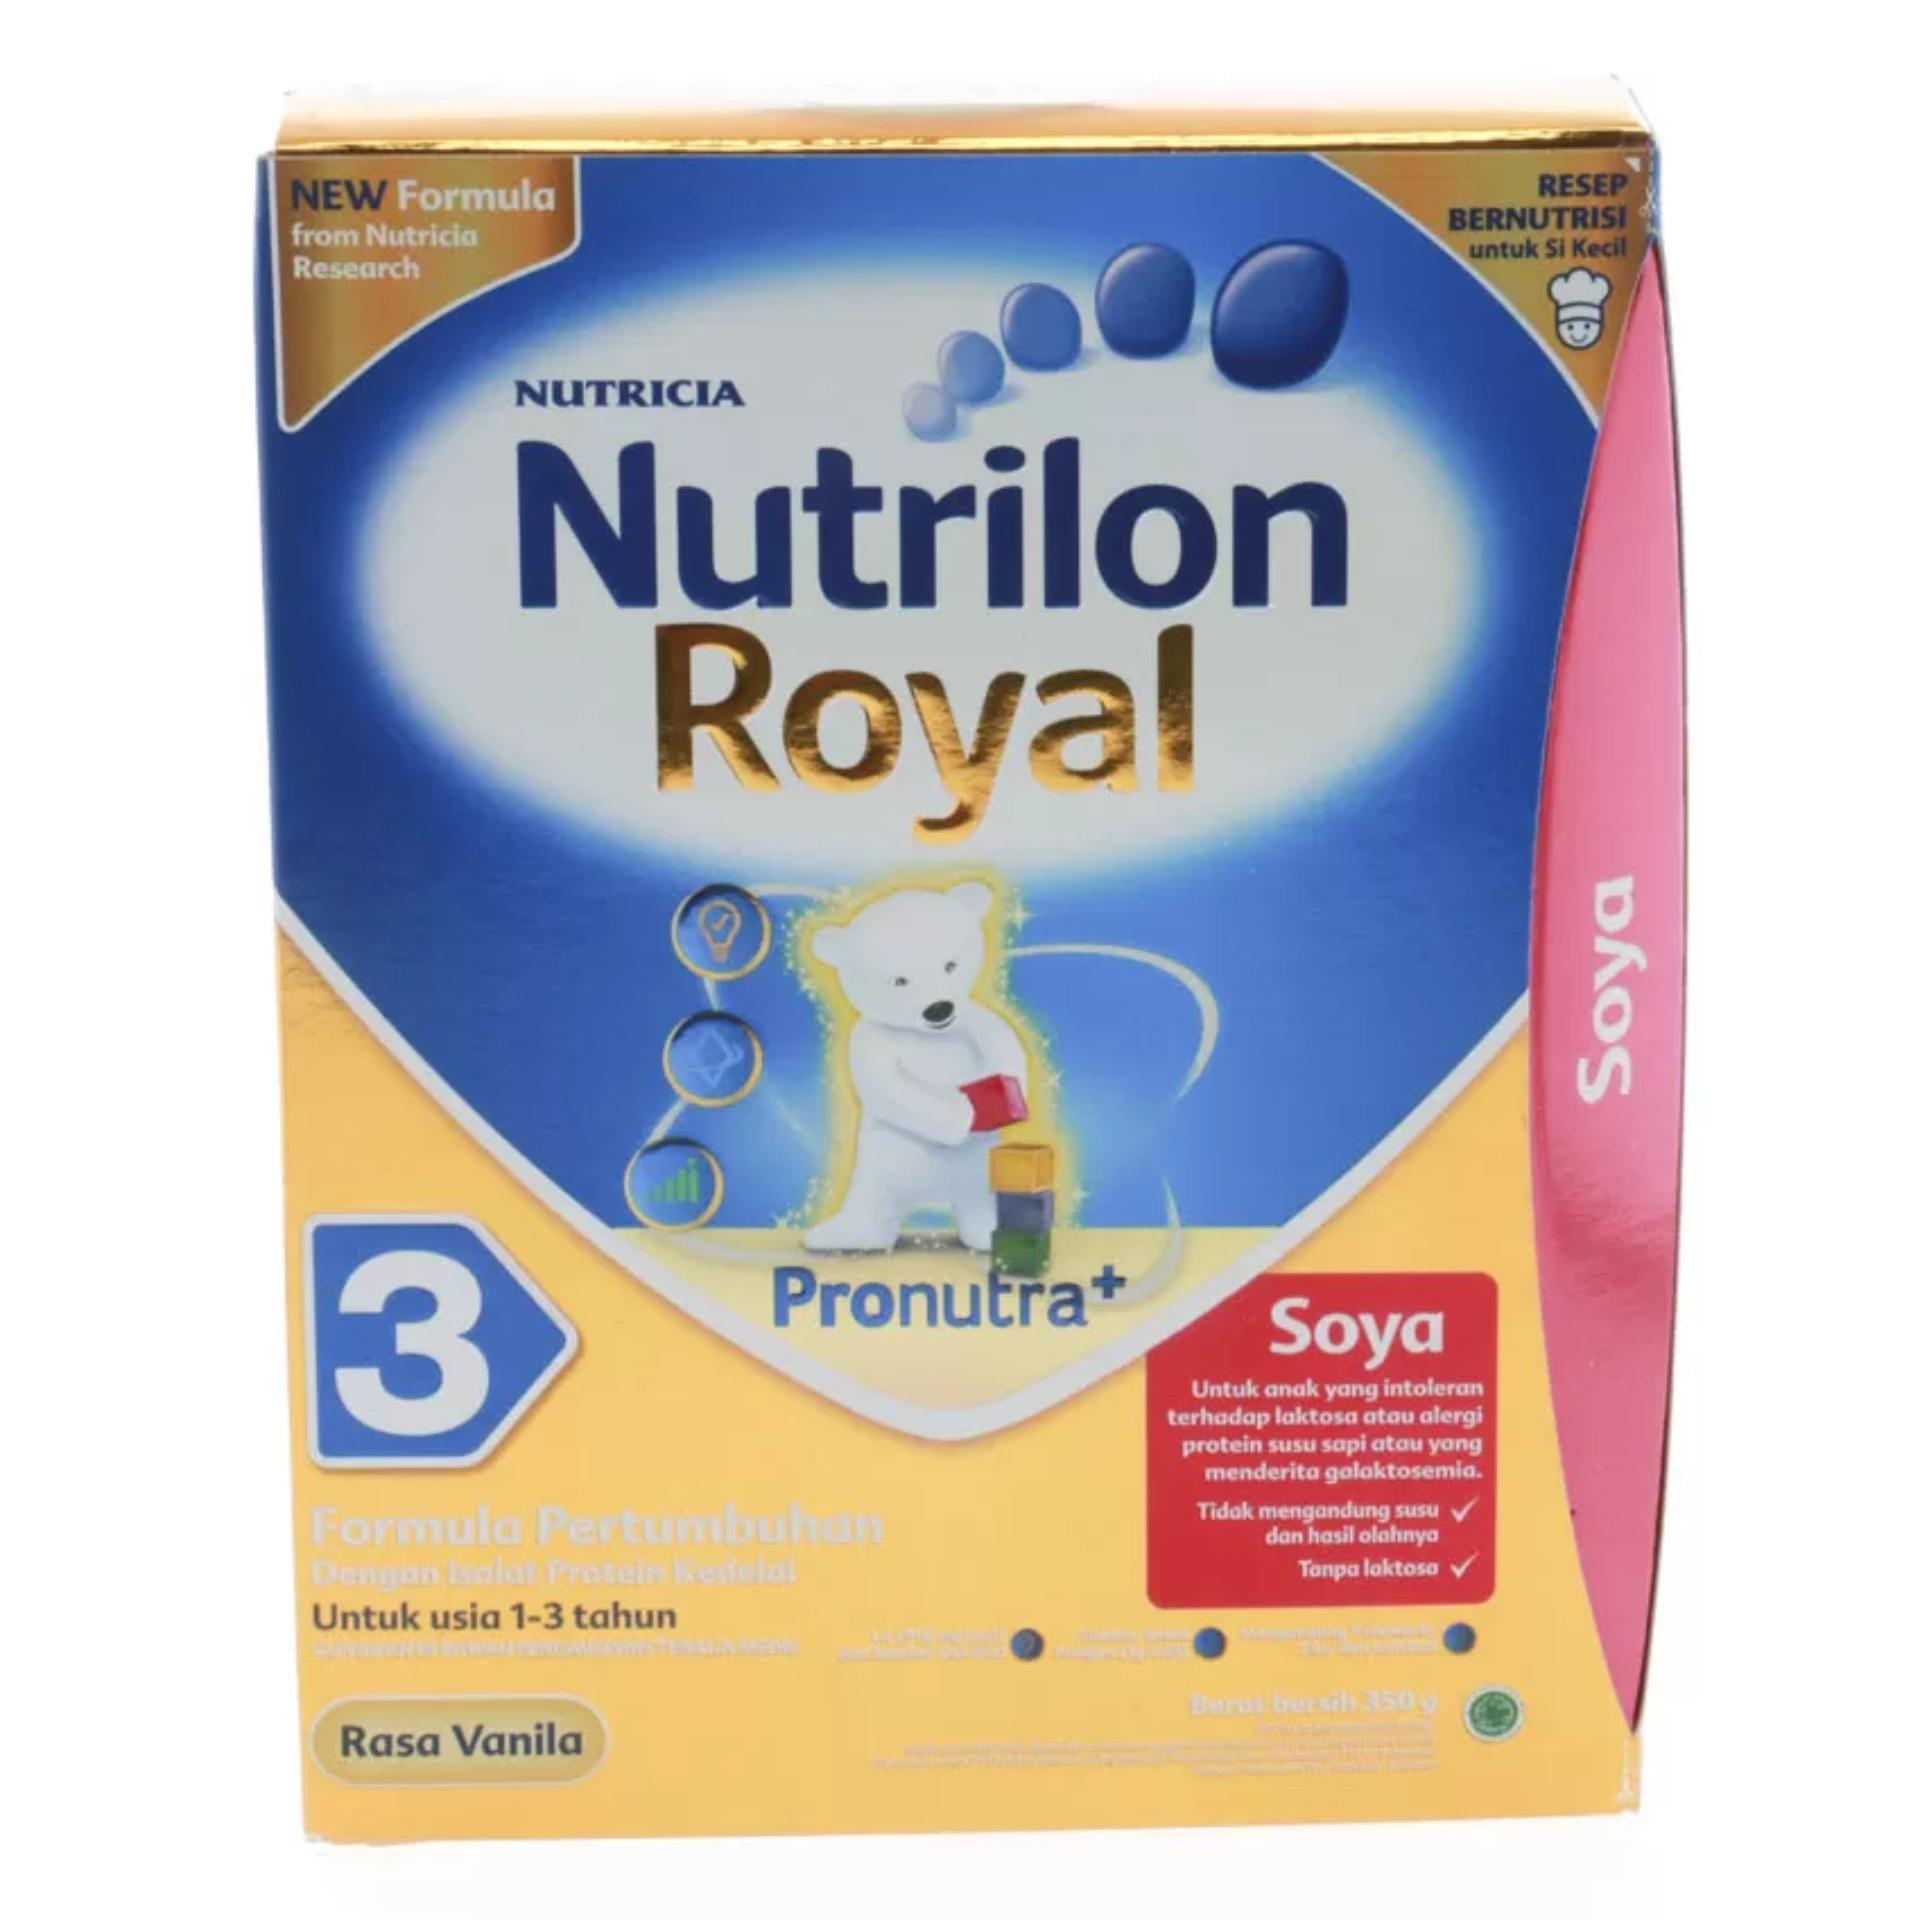 Nutrilon Royal Soya 3 Pronutra Susu Pertumbuhan - Vanilla - 350gr